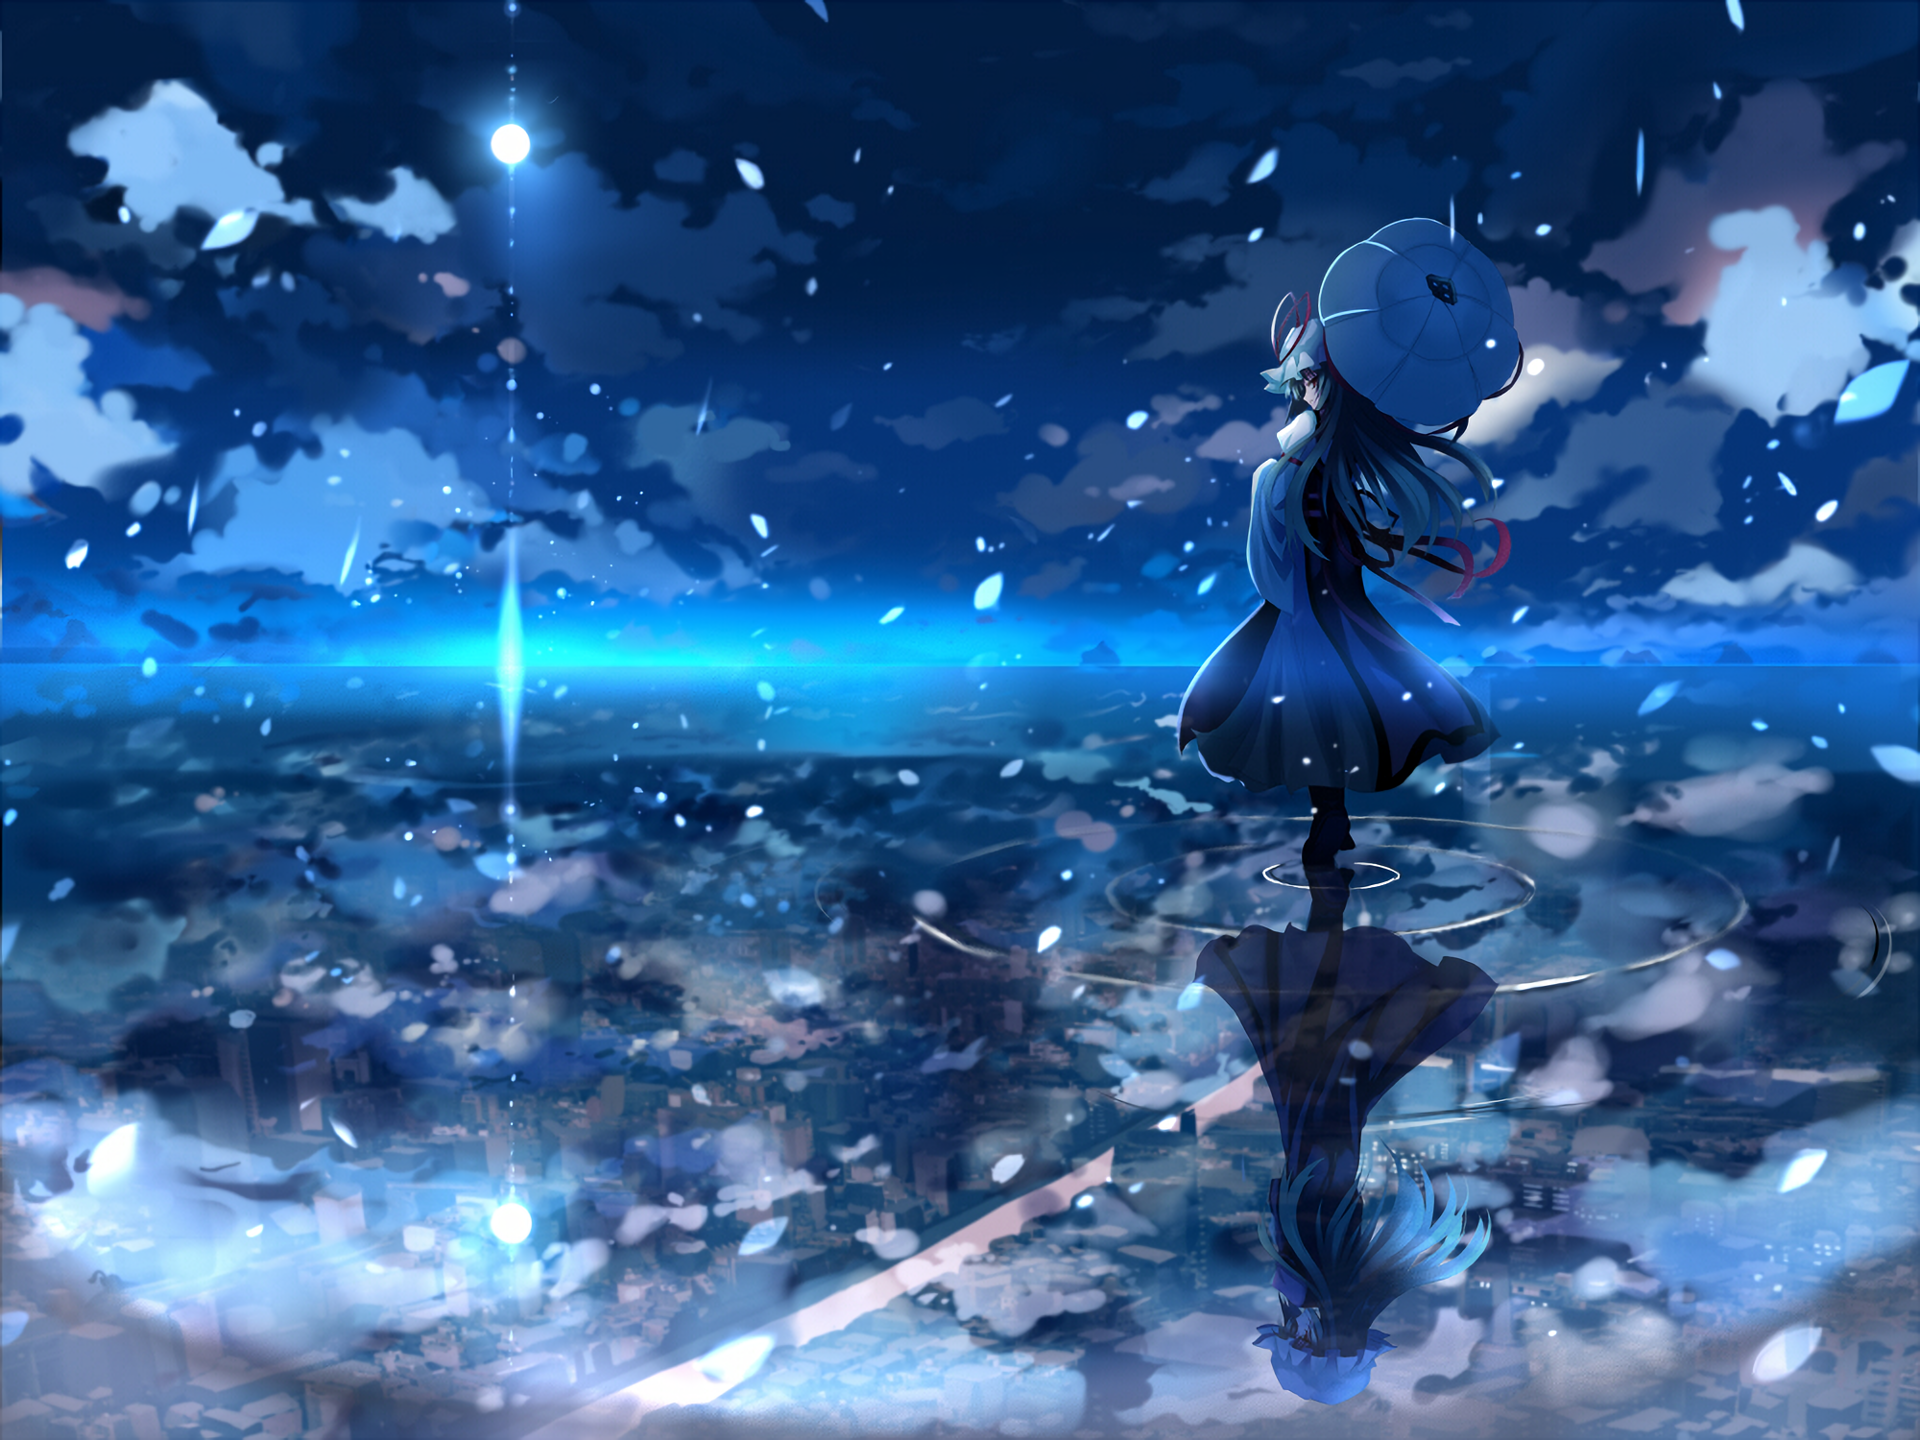 Anime Touhou Yukari Yakumo Wallpaper Anime Scenery Anime Scenery Wallpaper Anime Background